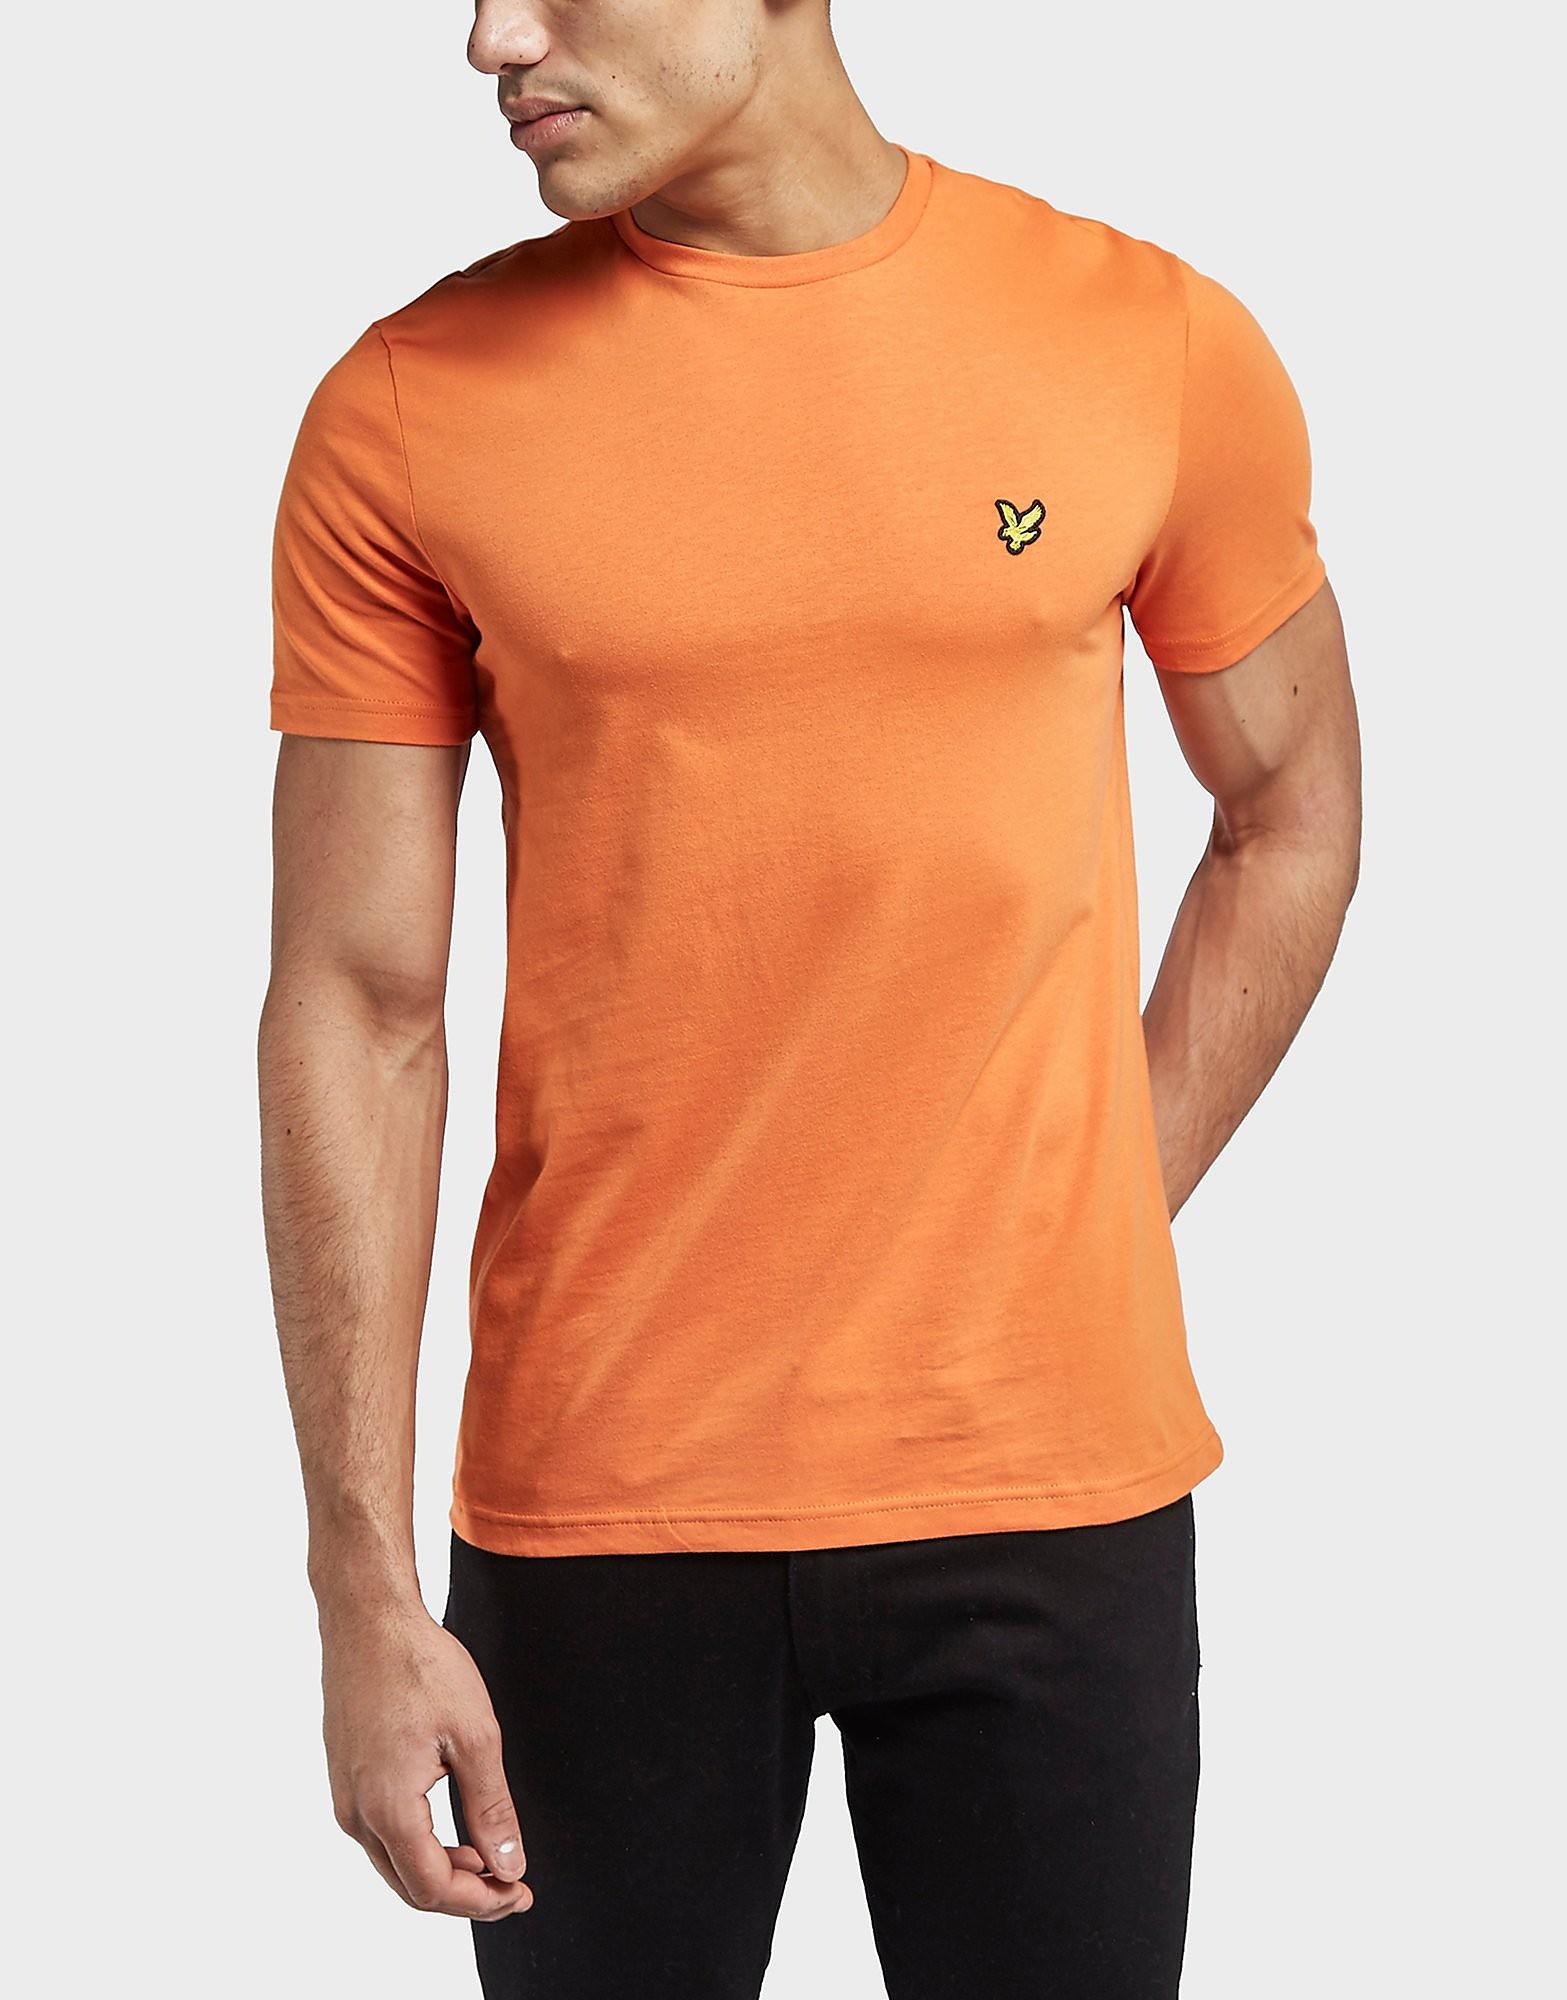 Lyle & Scott Short Sleeve Crew T-Shirt